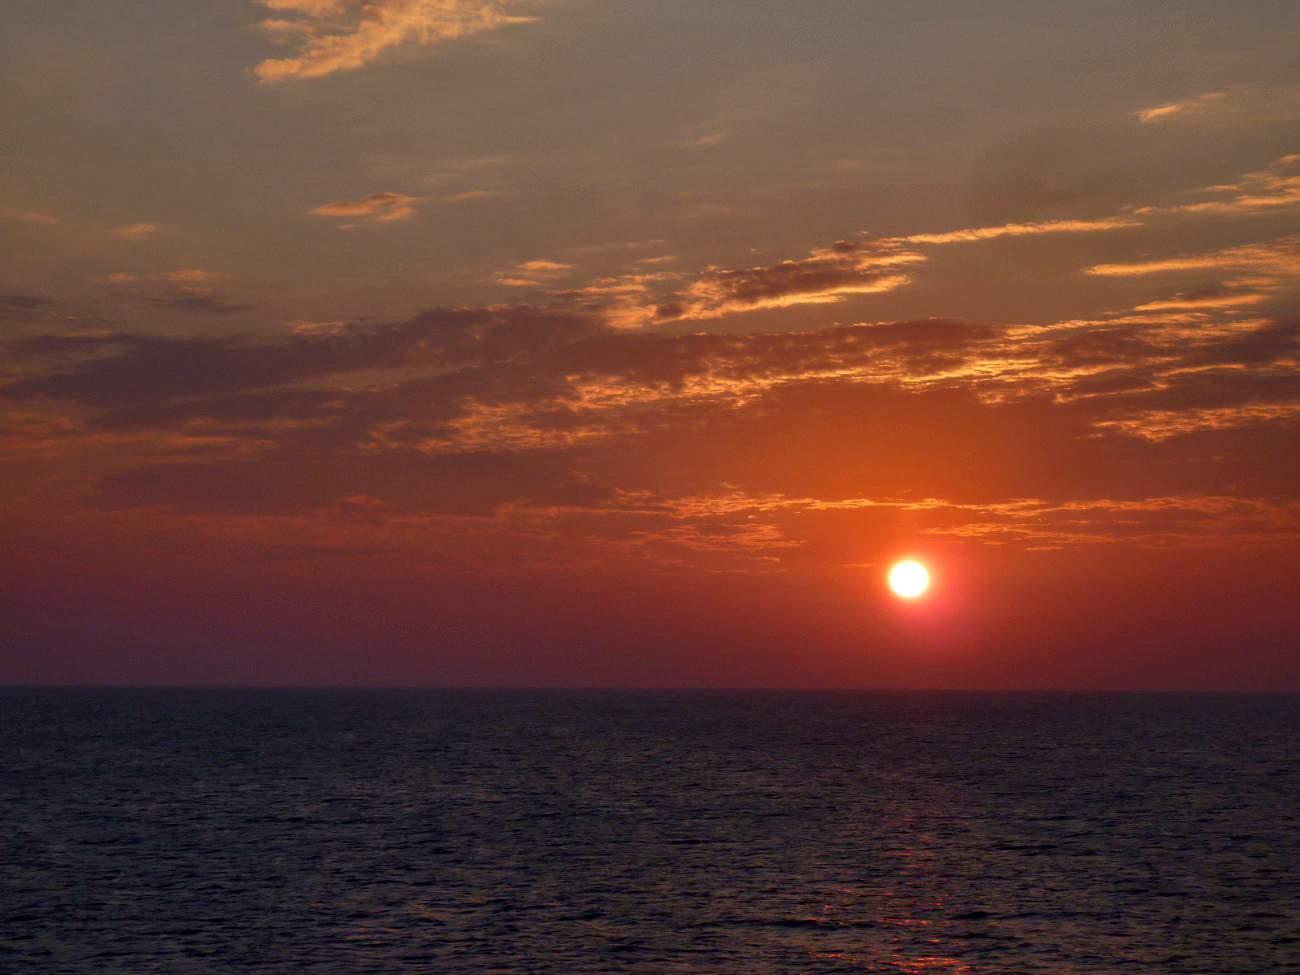 schweden-malmoe-impressions-sunset2b